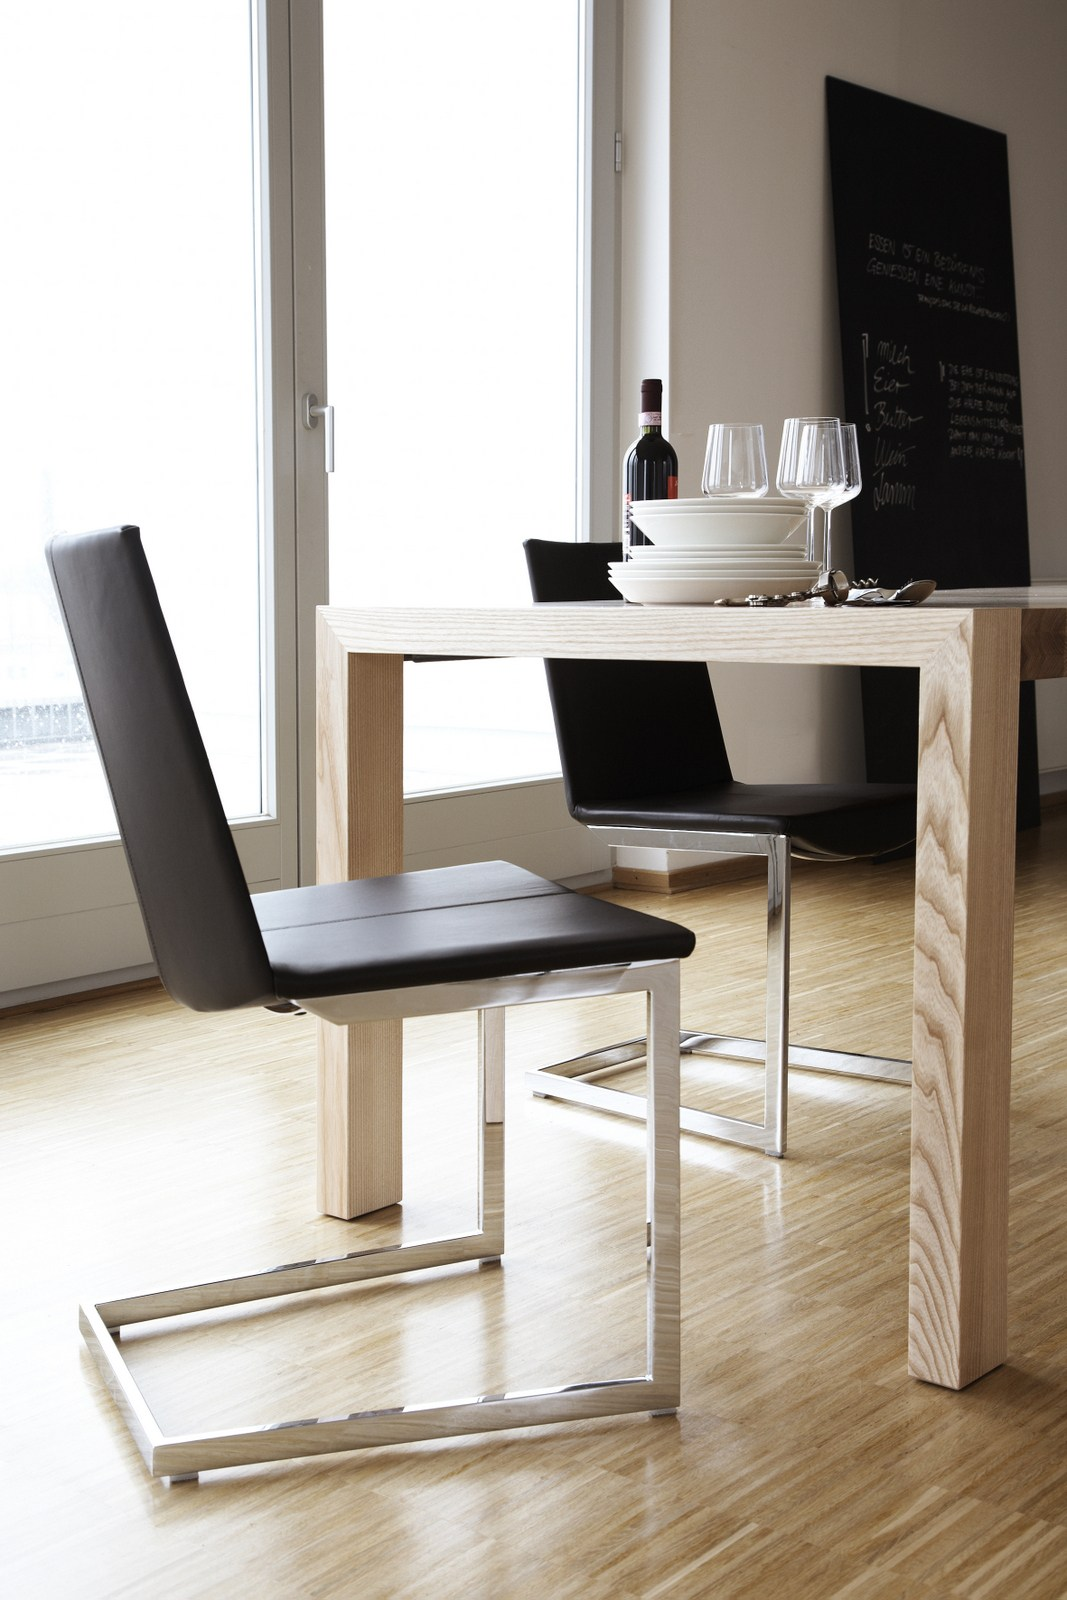 tibet chaise en porte faux by kff design andrei munteanu. Black Bedroom Furniture Sets. Home Design Ideas